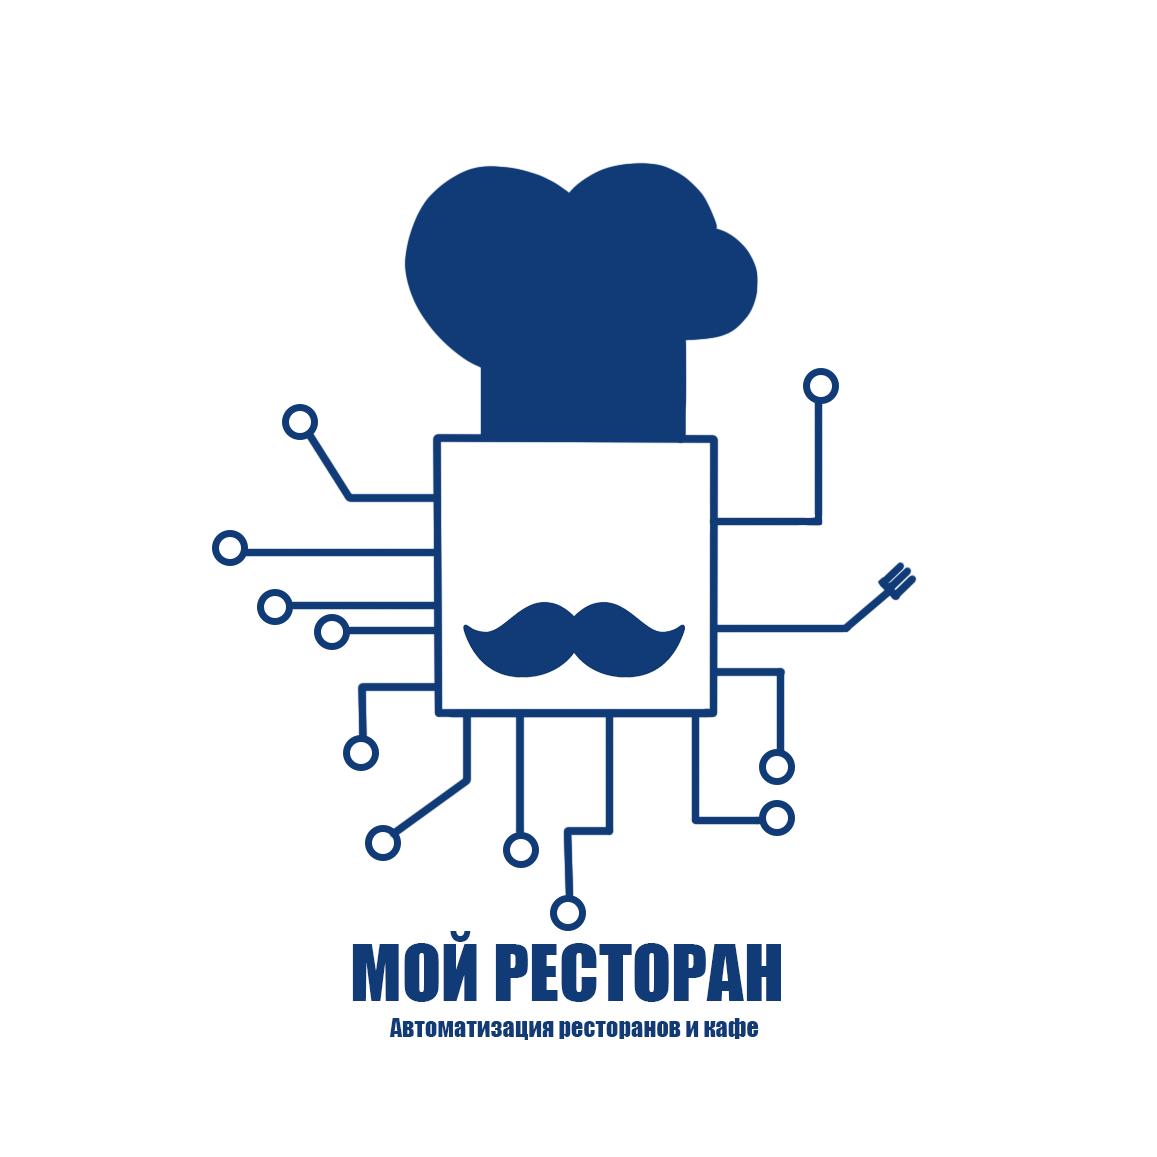 Разработать логотип и фавикон для IT- компании фото f_6535d52d09dec068.png